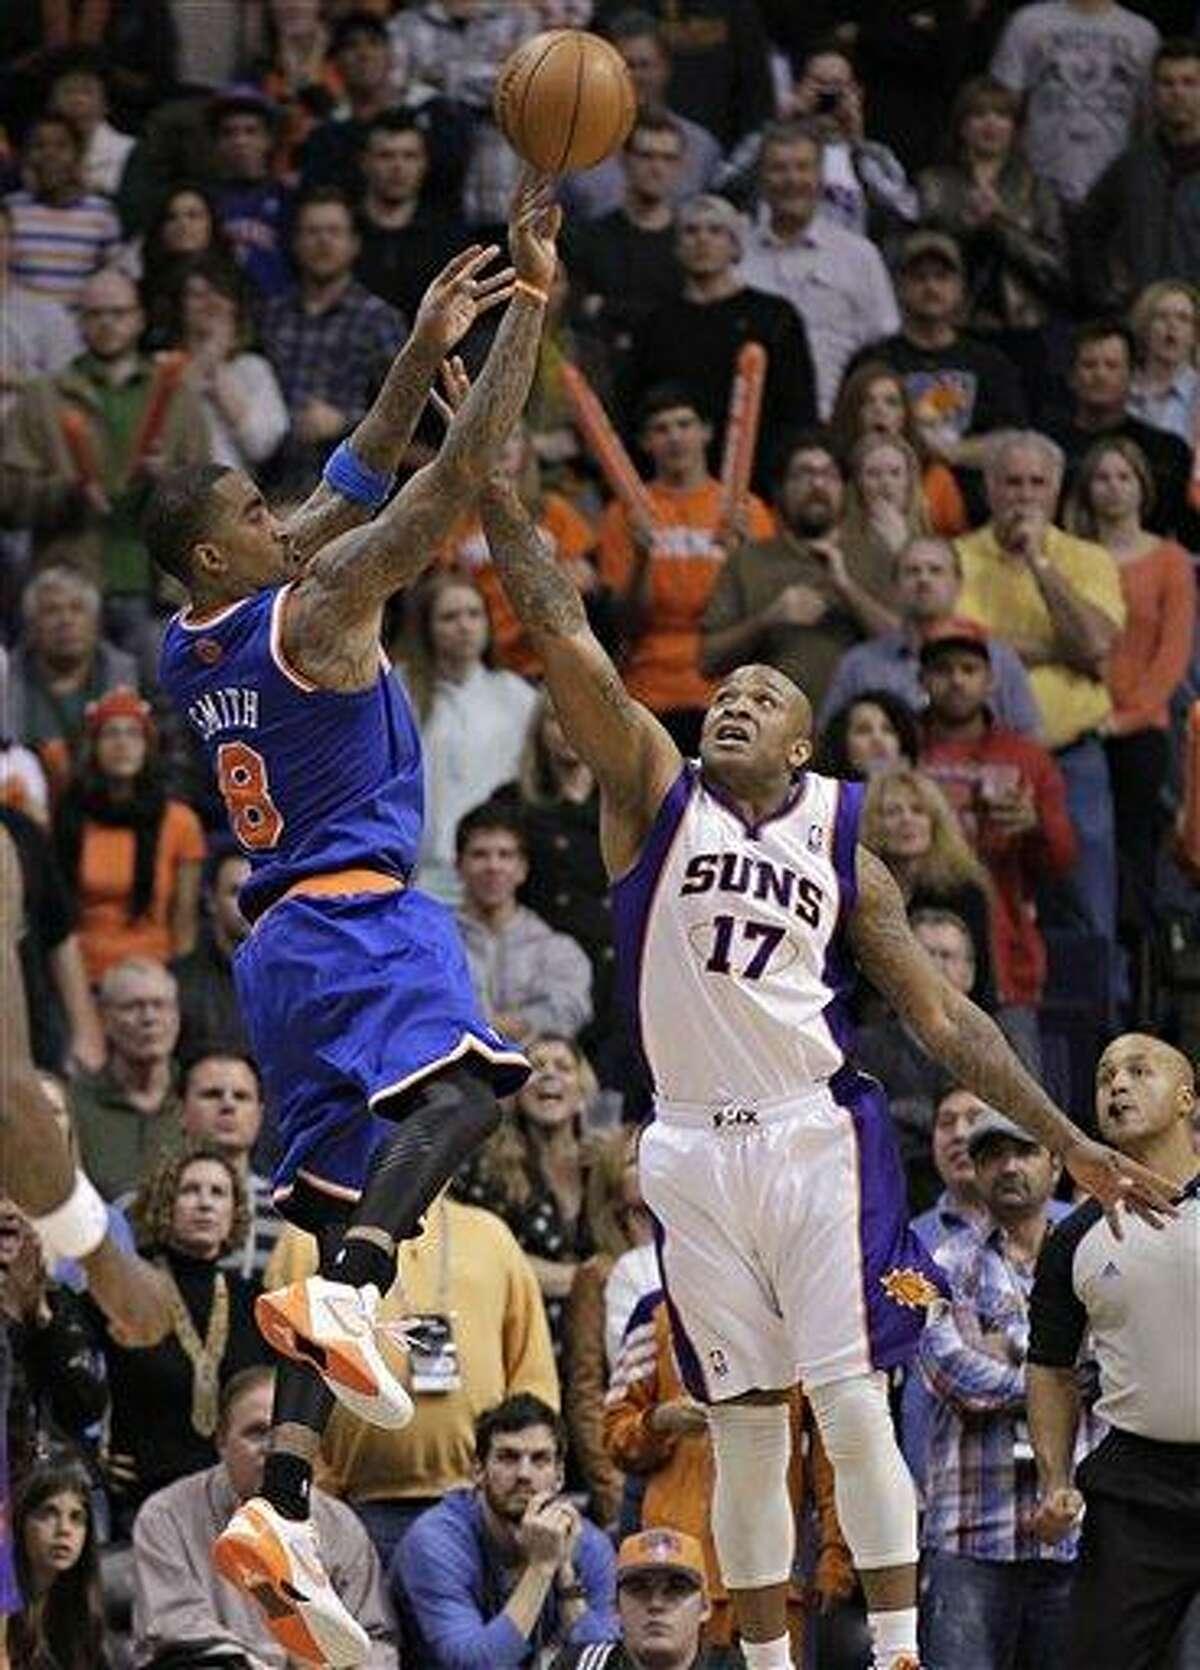 New York Knicks' J.R. Smith (9) takes the game-winning shot over Phoenix Suns' P.J. Tucker (17) during the second half of an NBA basketball game, Wednesday, Dec. 26, 2012, in Phoenix. The Knicks won 99-97. (AP Photo/Matt York)